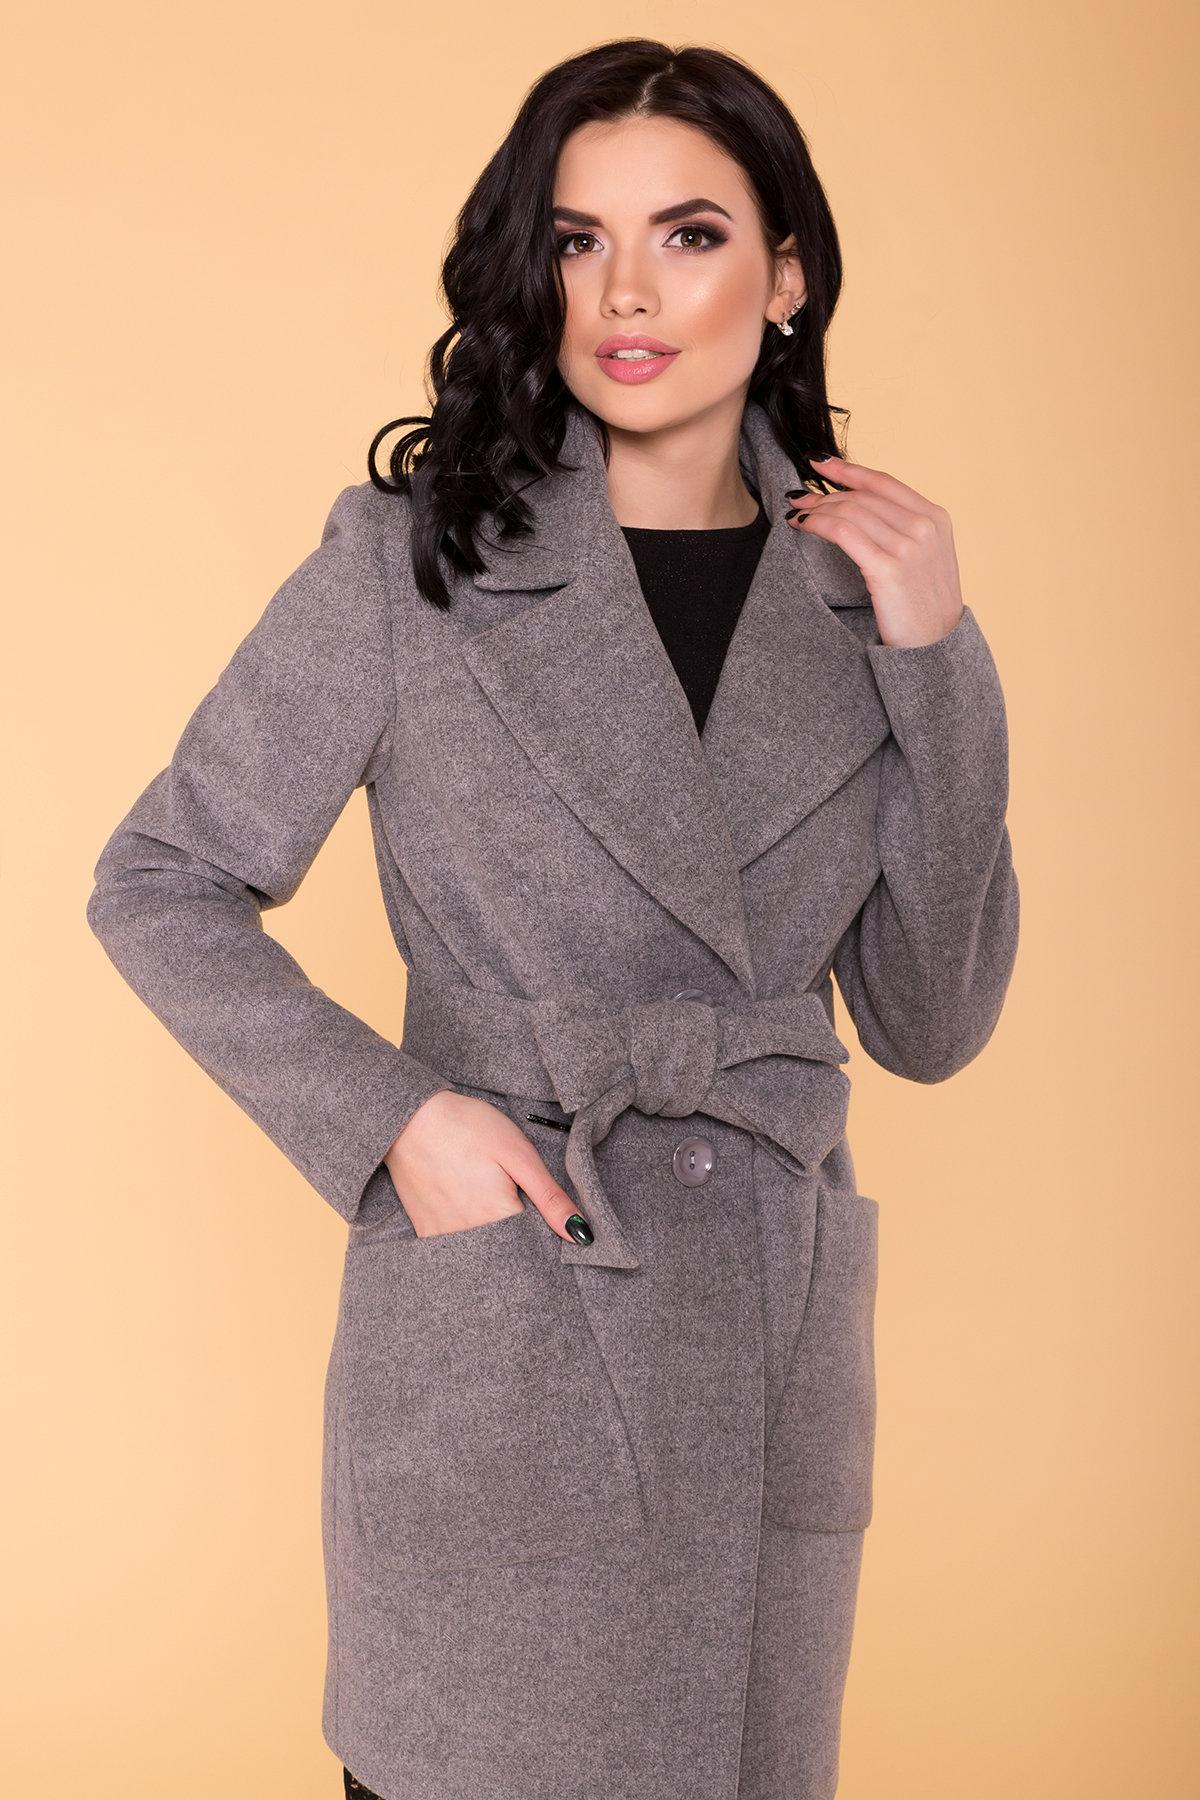 Пальто Габриэлла 4417 АРТ. 21204 Цвет: Серый 18 - фото 5, интернет магазин tm-modus.ru